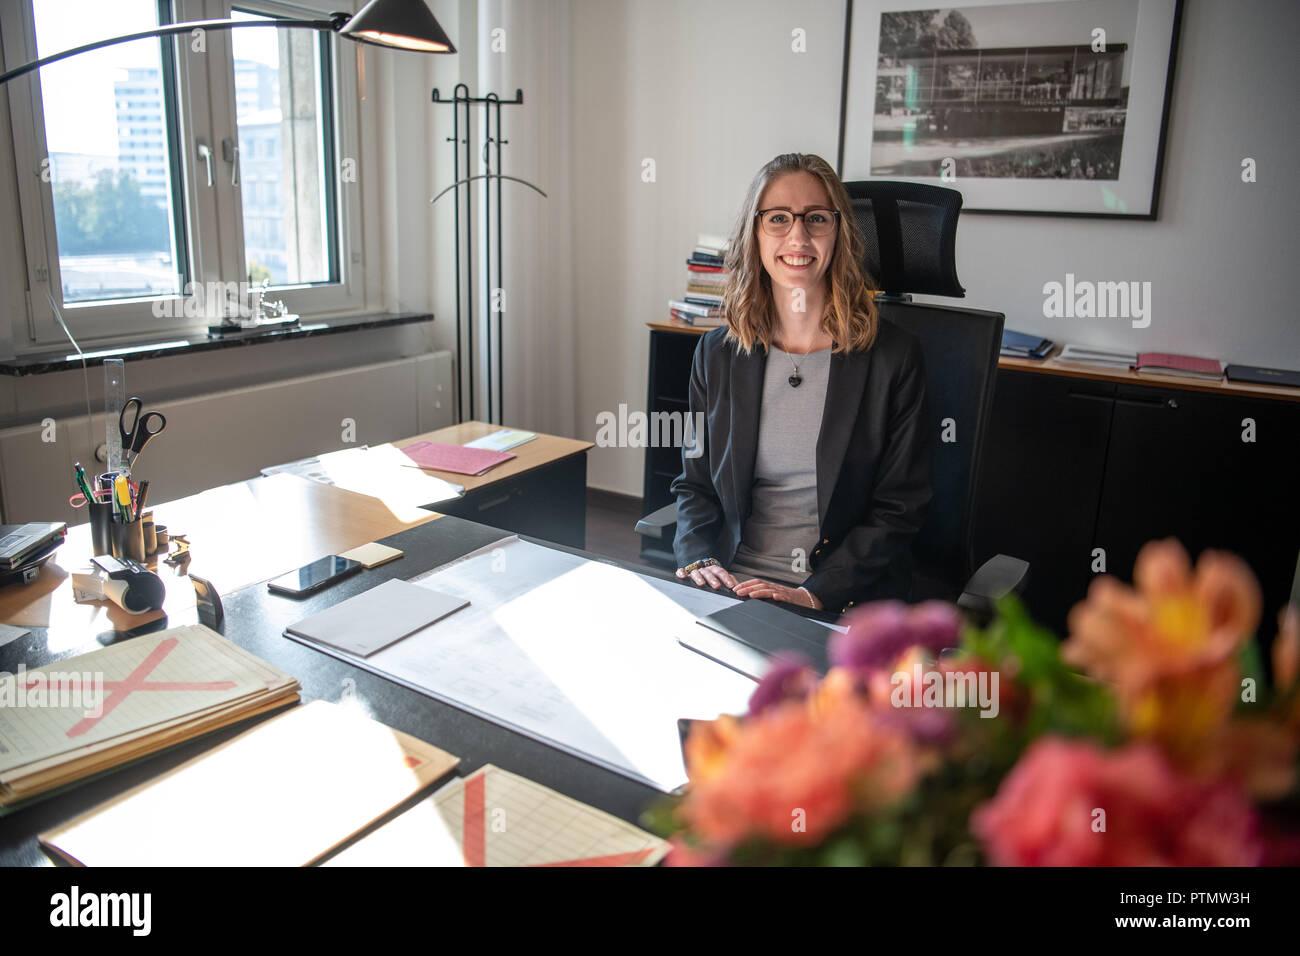 10 October 2018, Berlin: 21-year-old Celina Kühl, a student